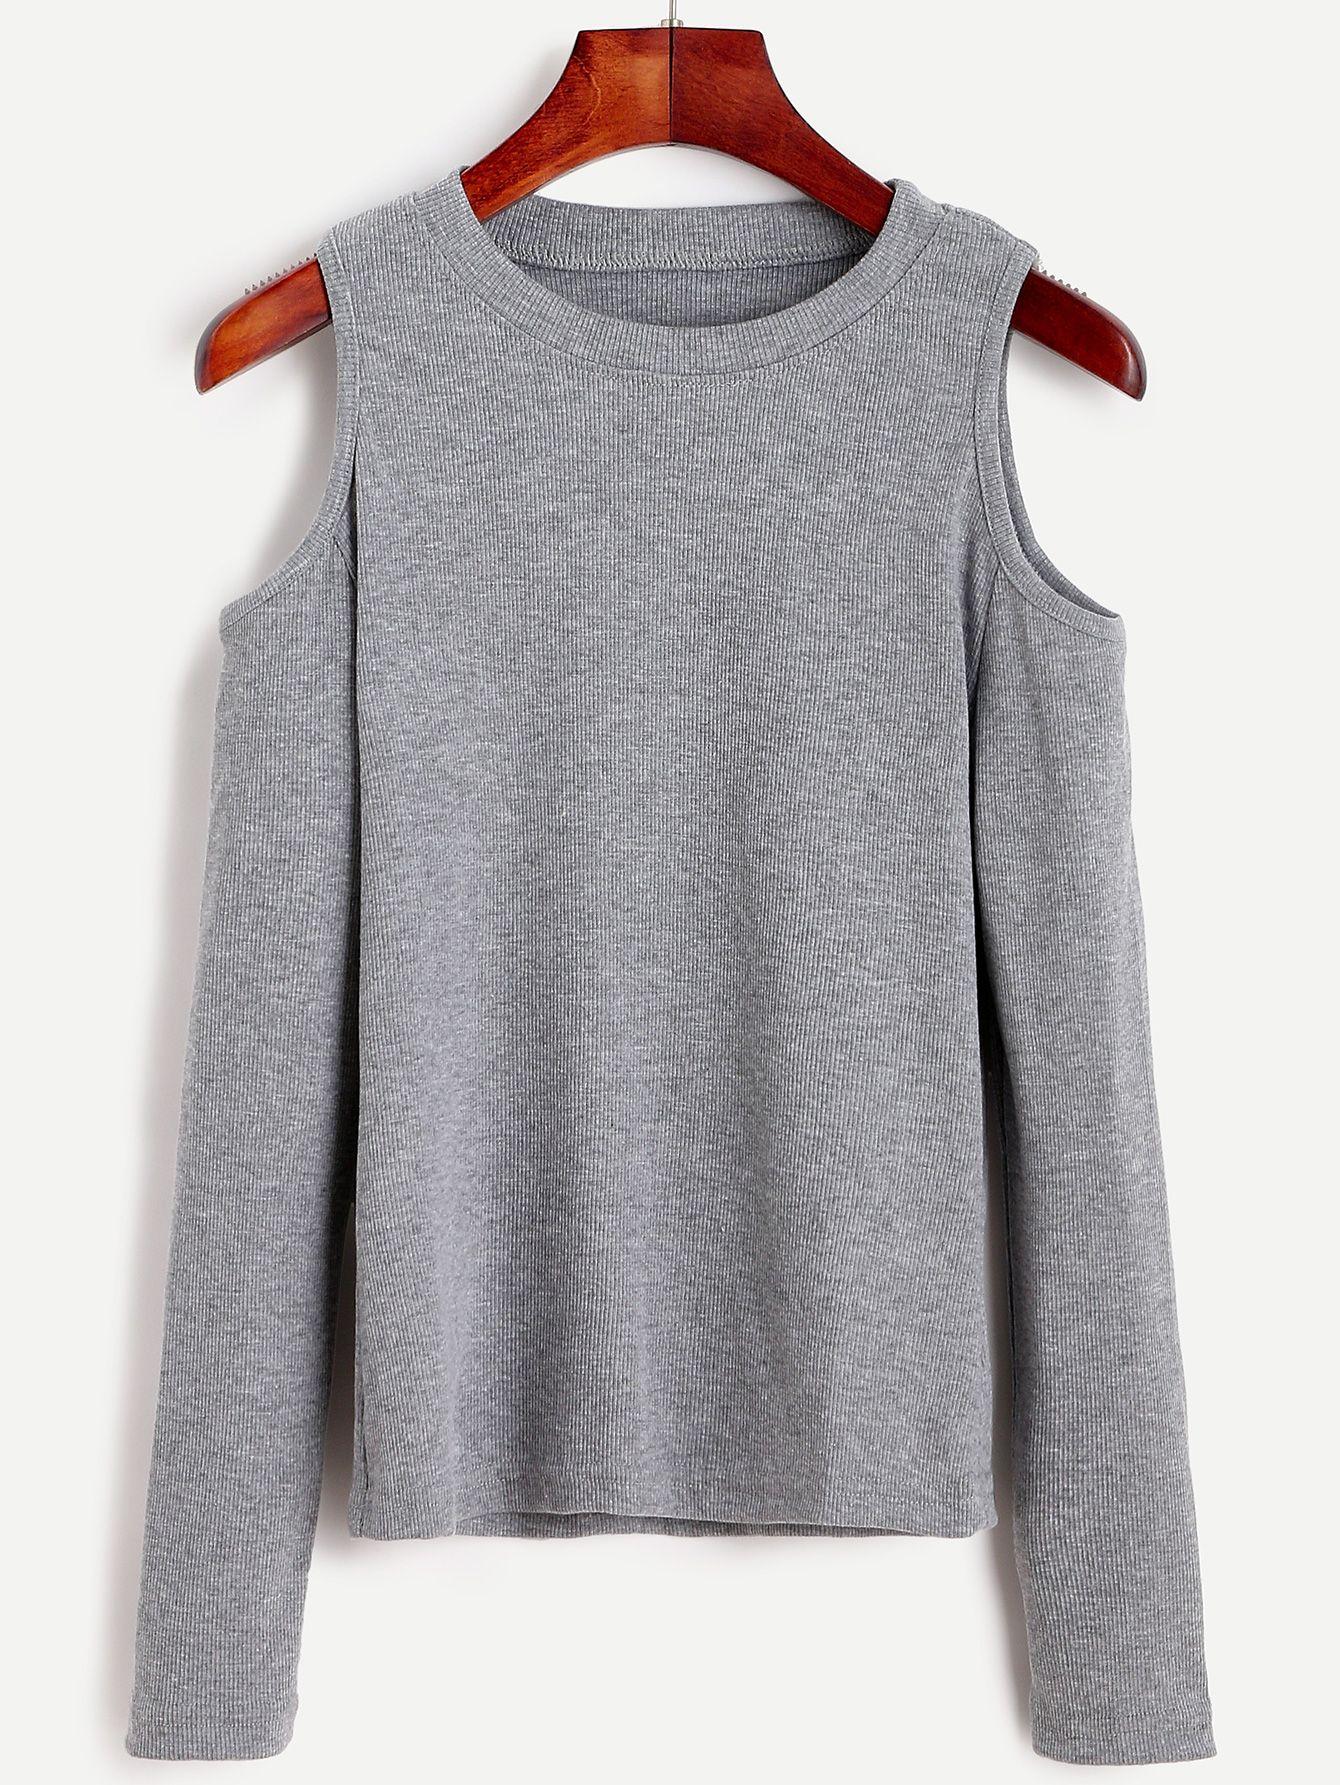 Open Shoulder Knit T-shirt | Colour gray, Shoulder and Gray